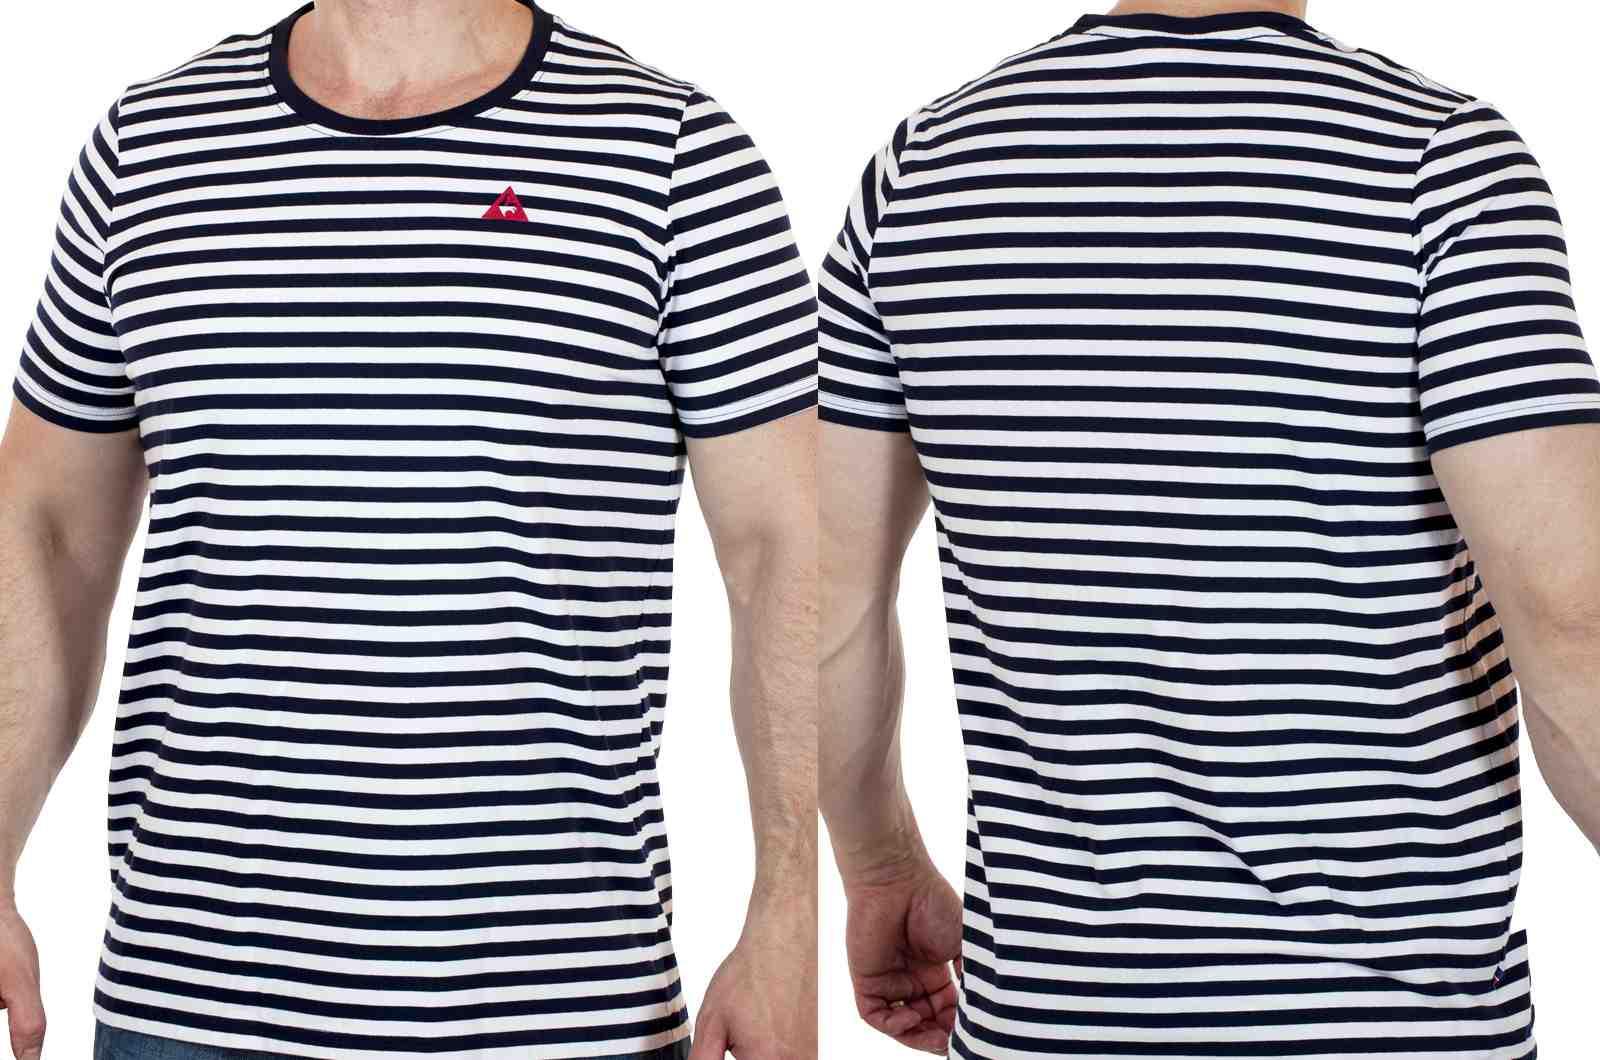 Мужская спортивная футболка Le Coq Sportif (Франция)-двойной ракурс